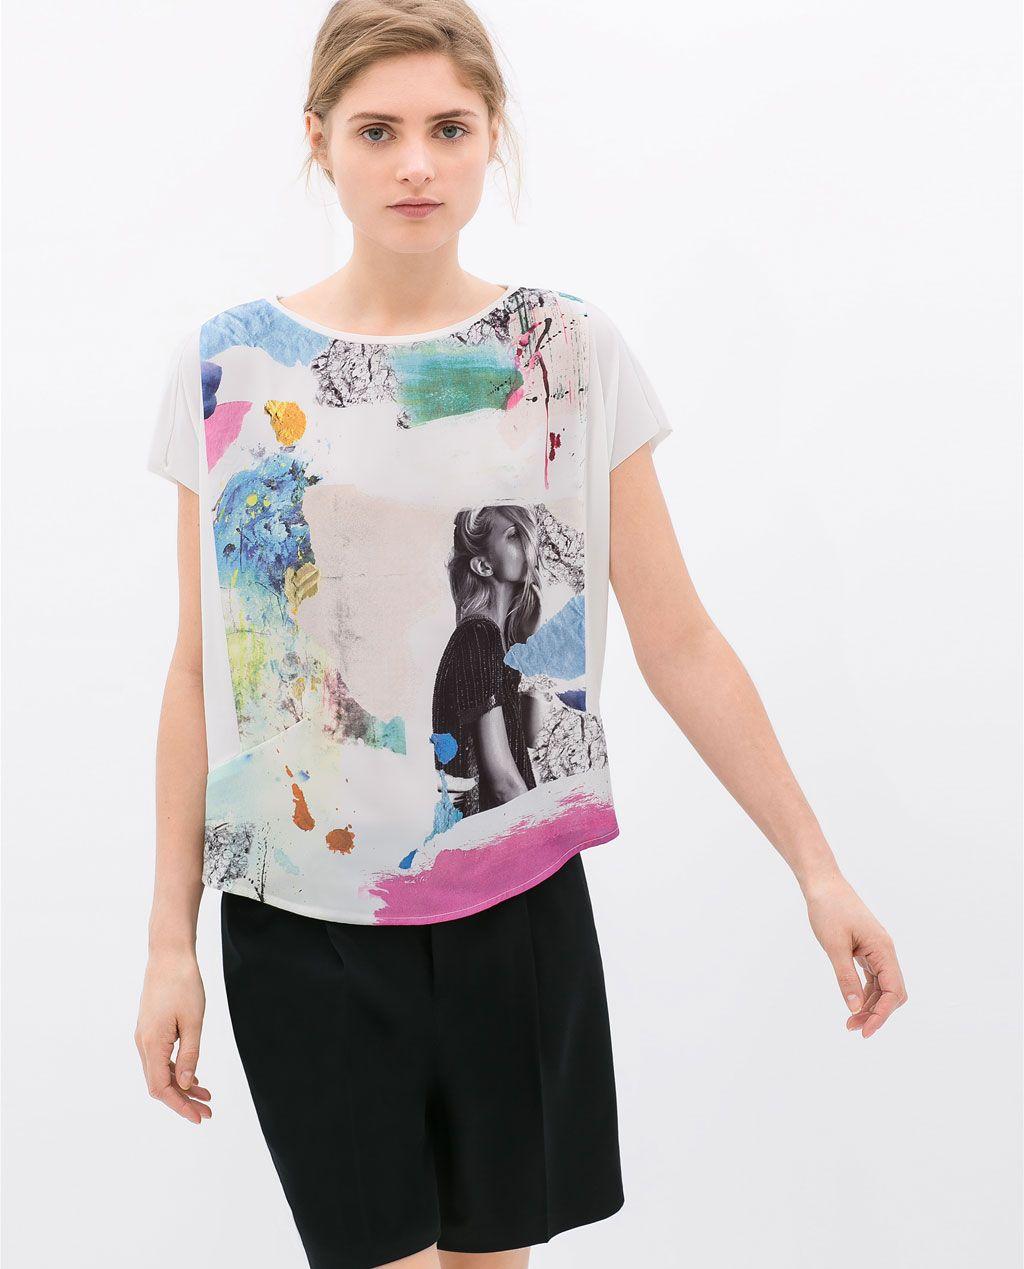 GIRL'S PRINTED T-SHIRT from Zara | Ropa, Diseña tu ropa ...